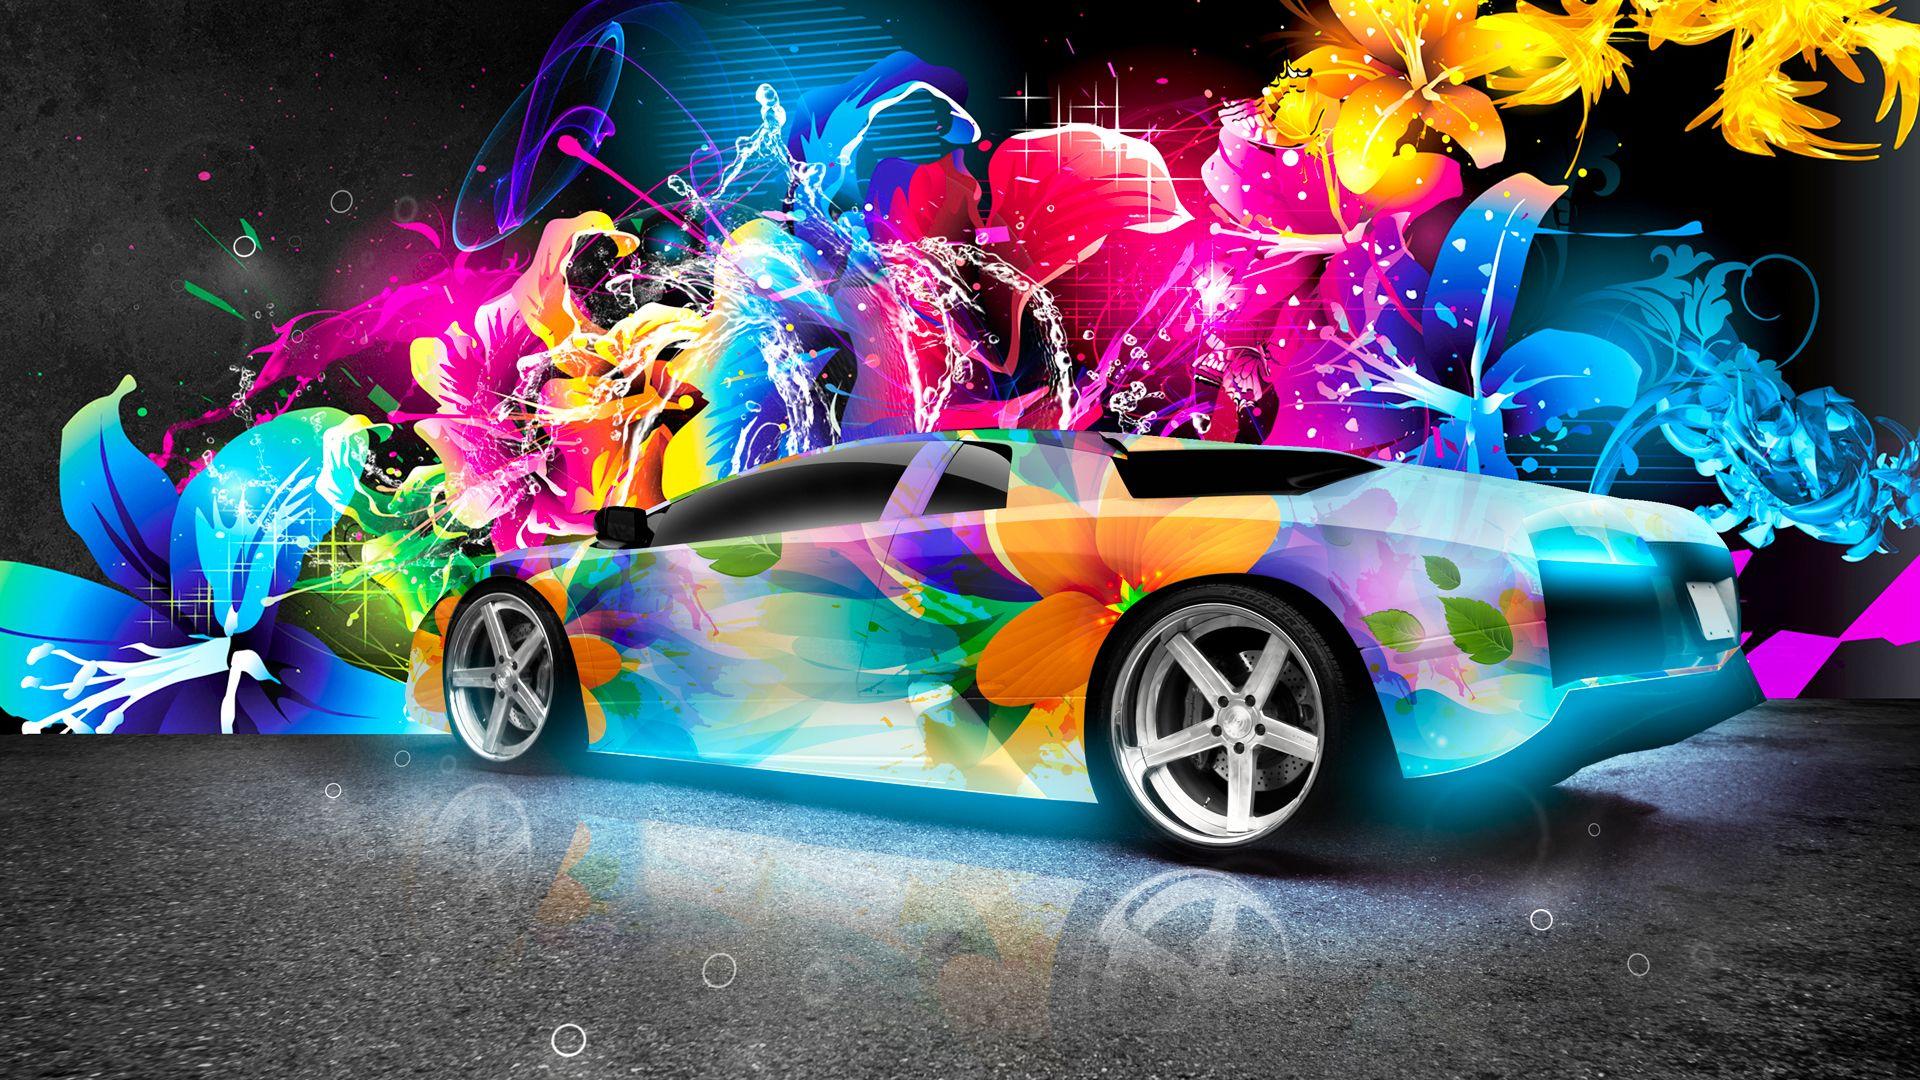 Stylish Bright Car Wallpaper Neon Cars